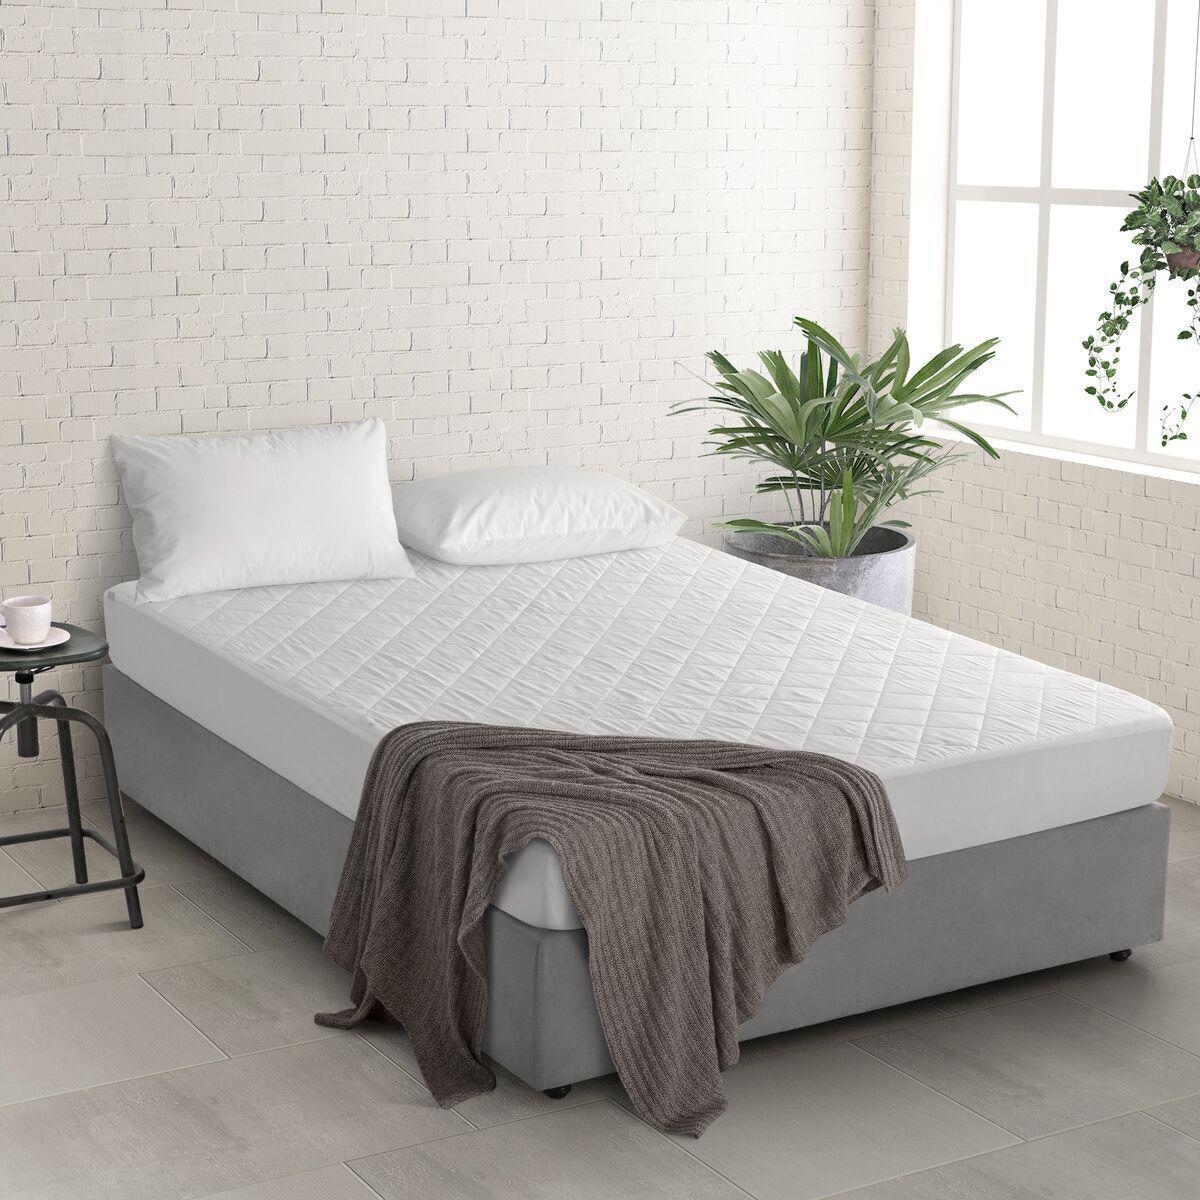 Natural Home Tencel Mattress Protector King Bed Matt Blatt